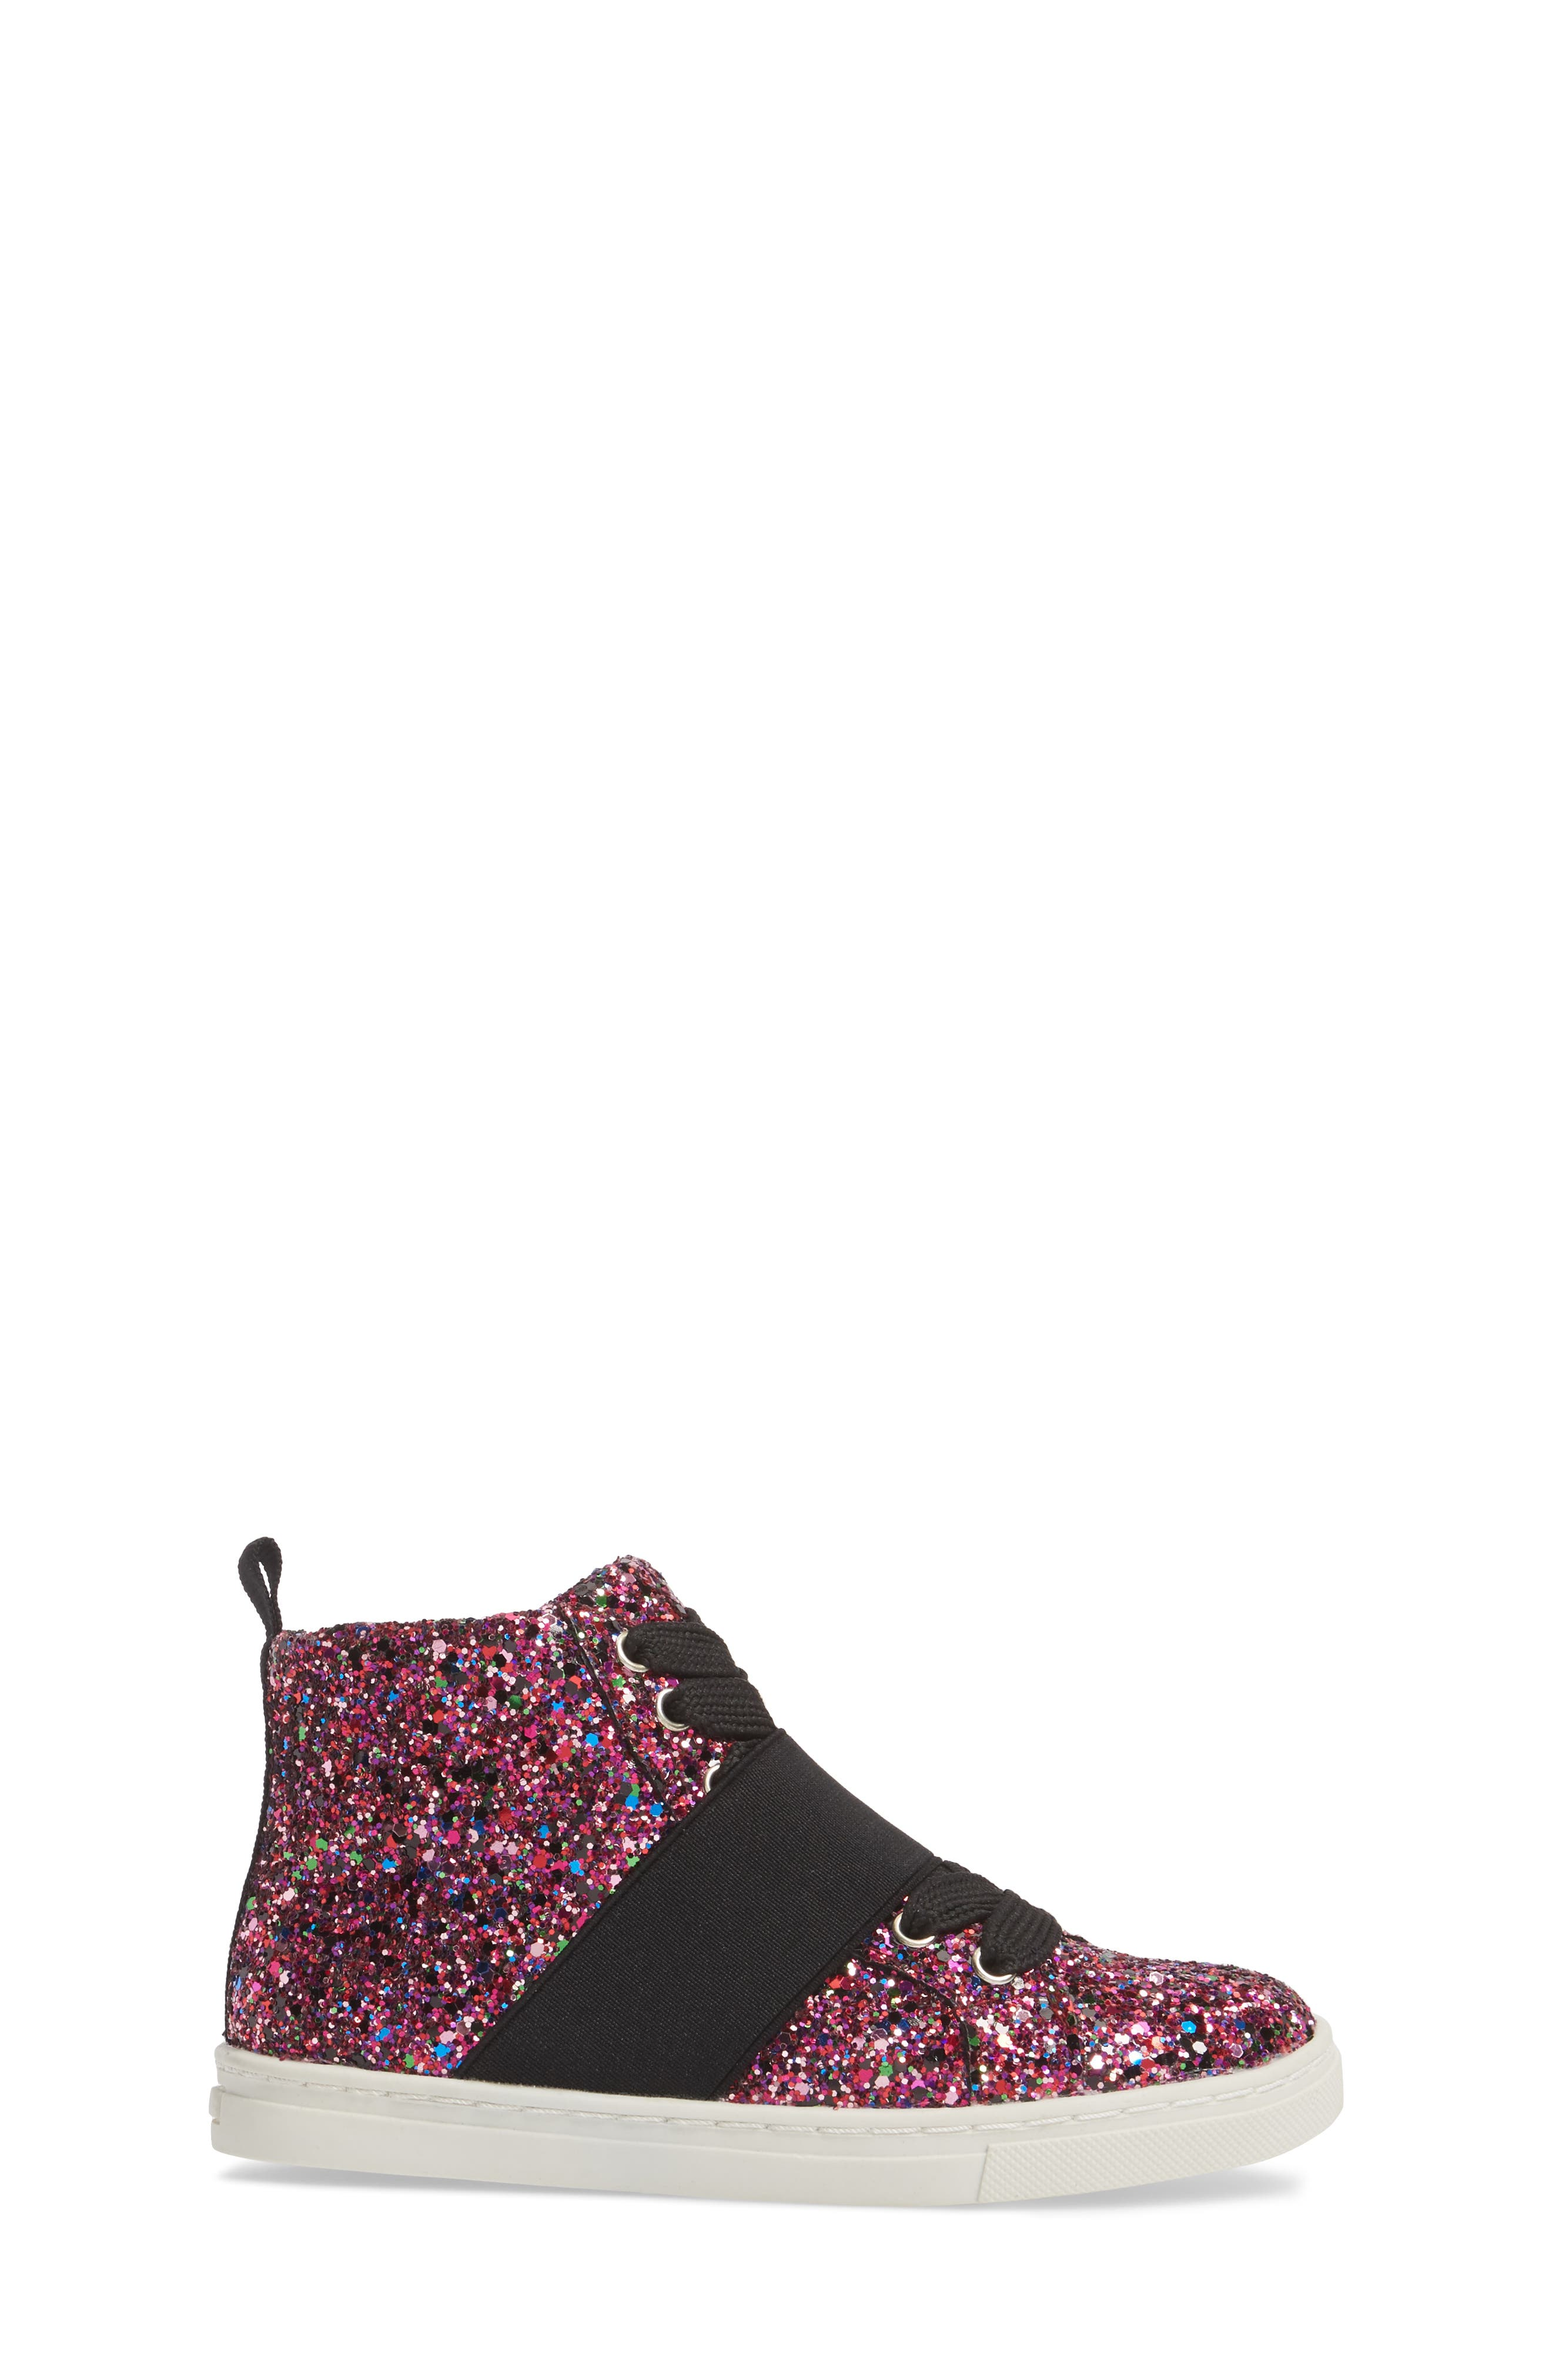 Zoa High Top Sneaker,                             Alternate thumbnail 3, color,                             Fuchsia Glitter